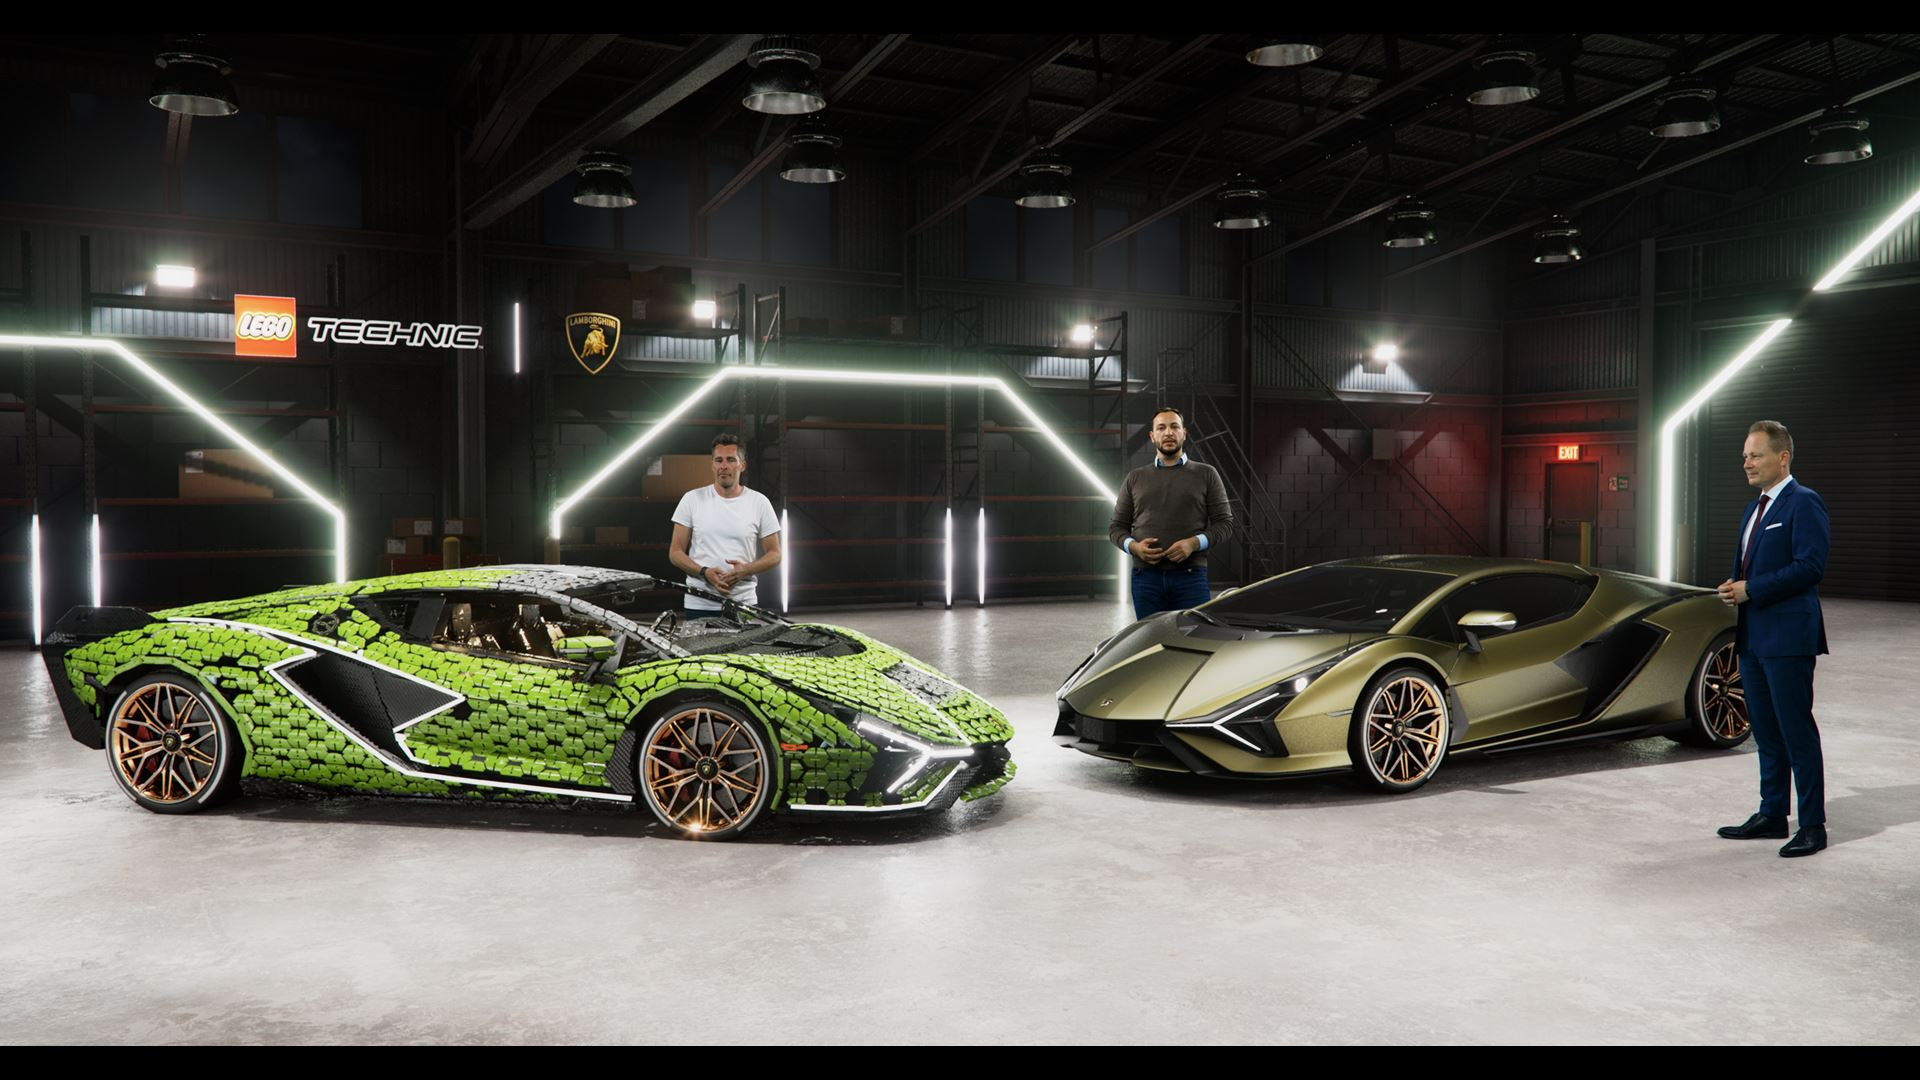 Automobili Lamborghini builds dream cars, also with LEGO® Technic™ - Life-size Lamborghini Sián FKP 37 created from over 400,000 LEGO® elements - Image 4